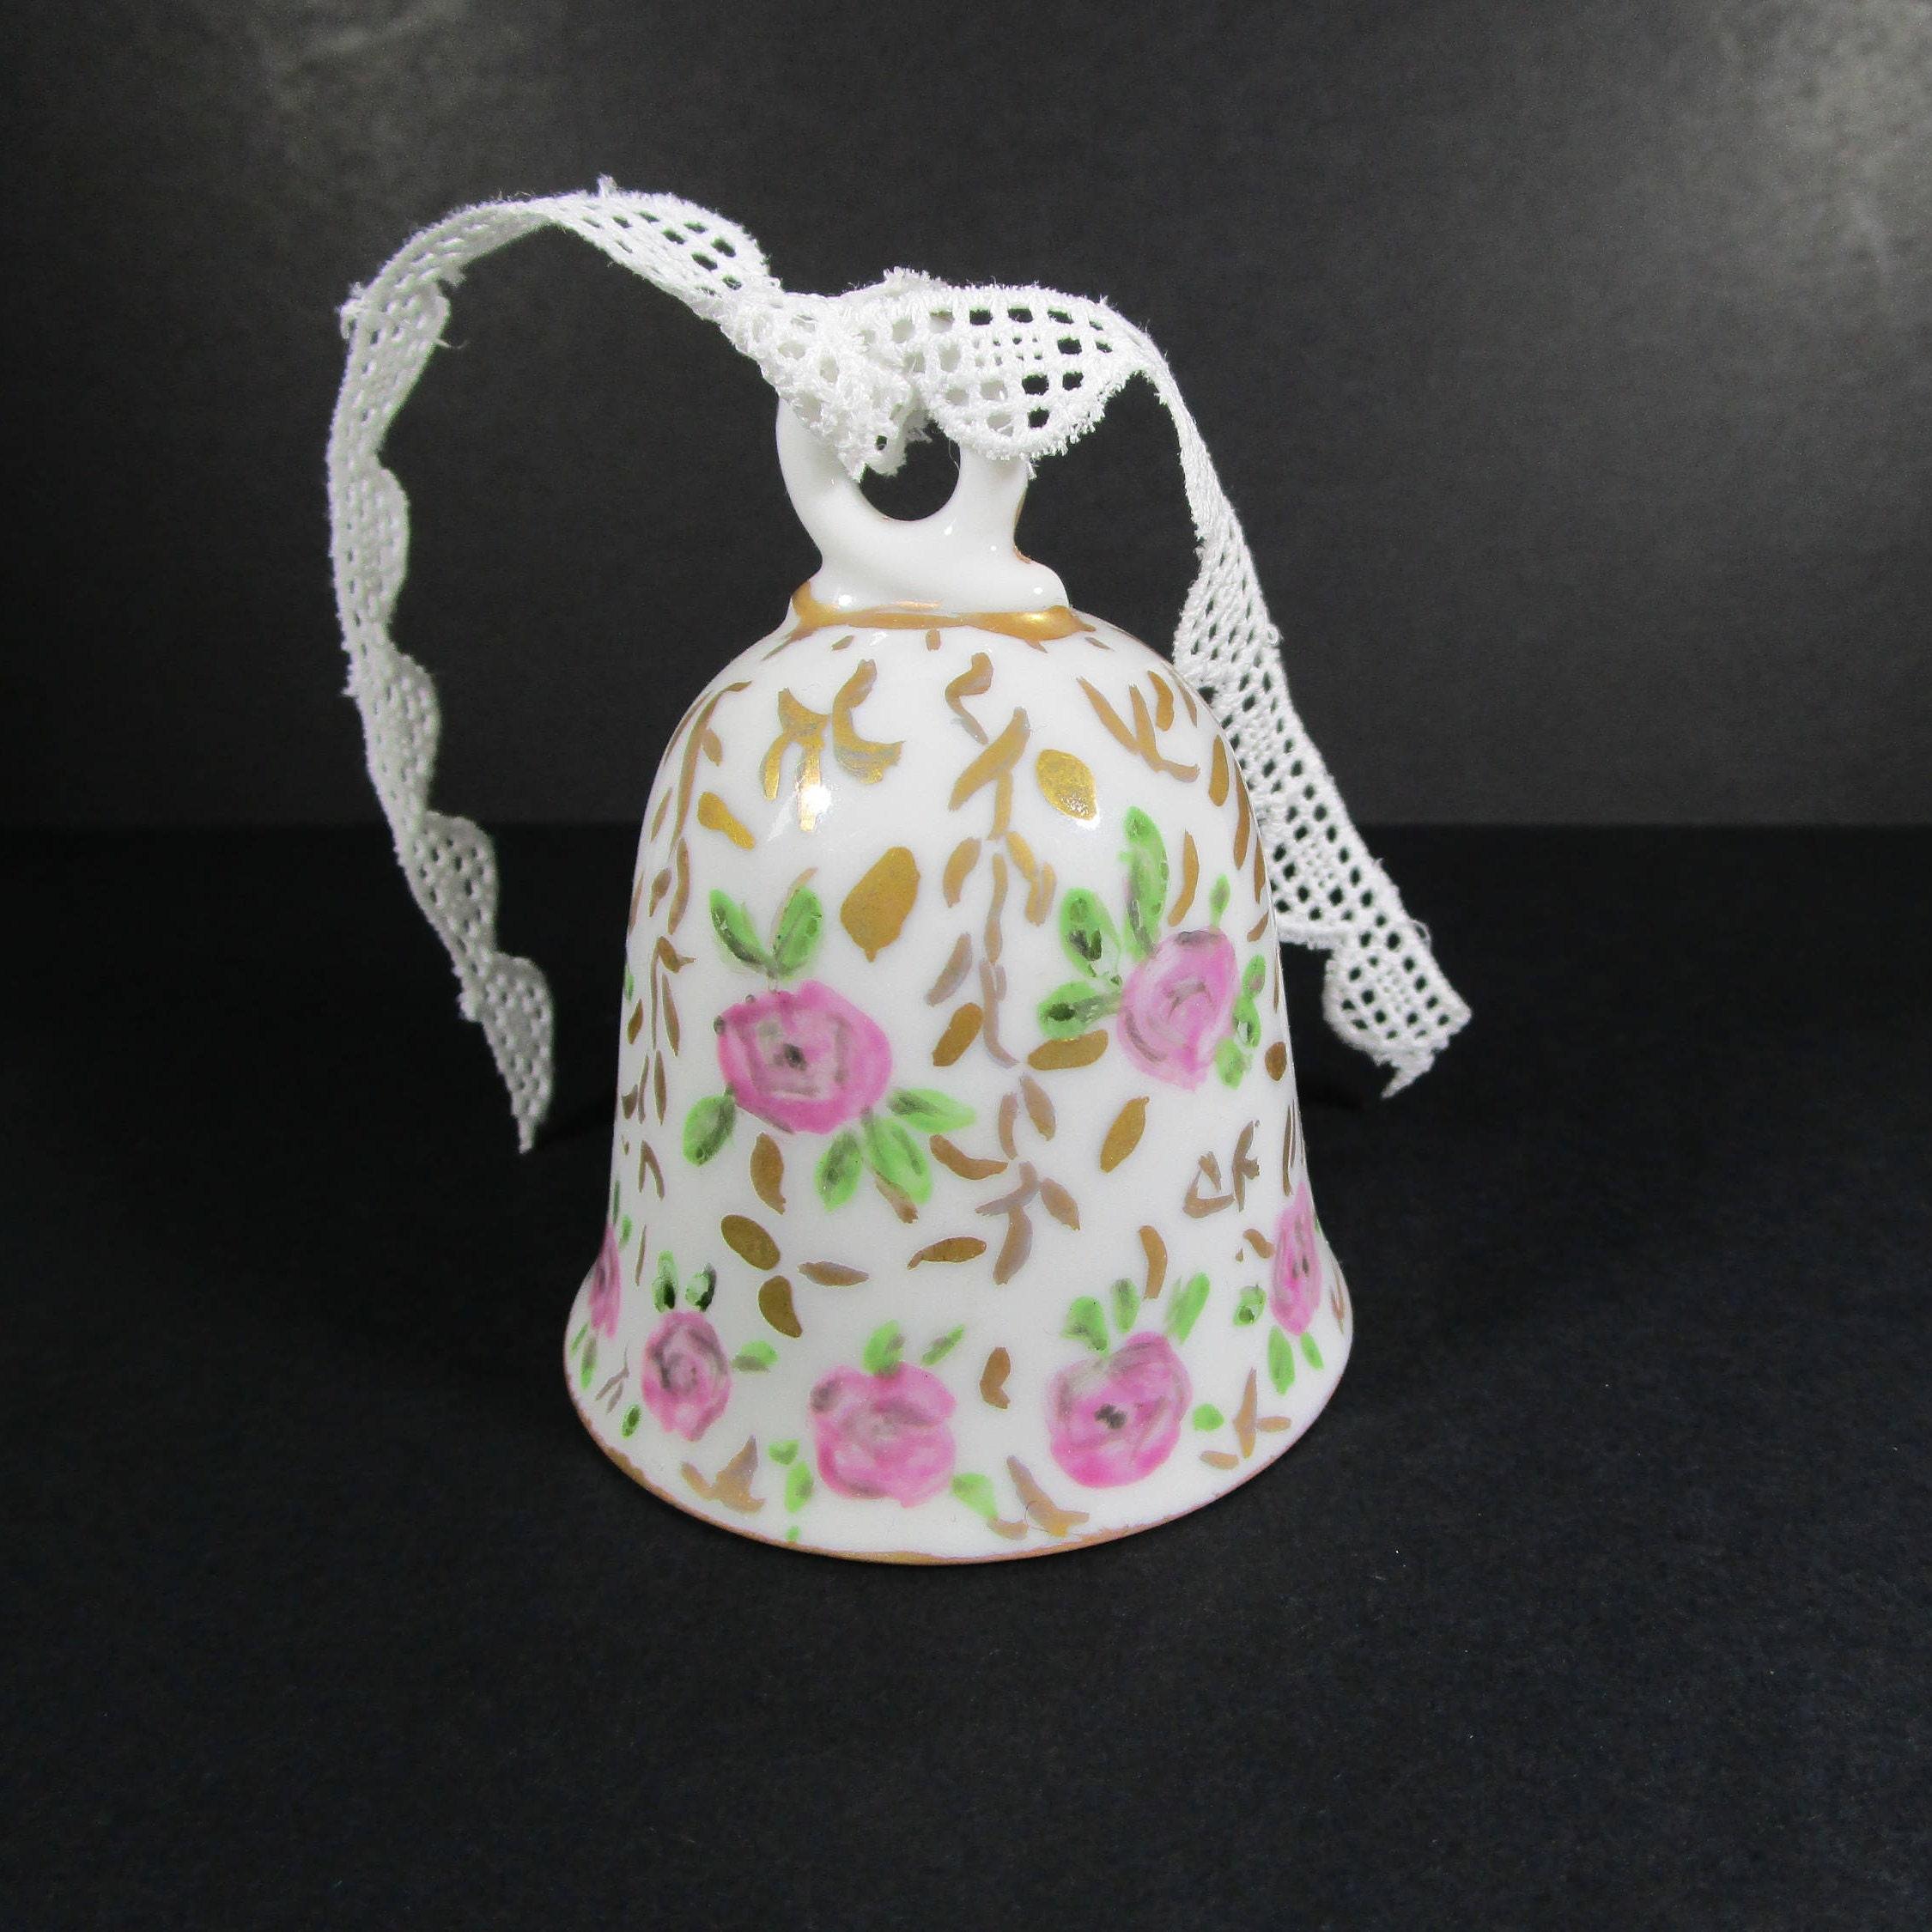 Vintage Porcelain Bell Hand Painted Bell Wedding Bell